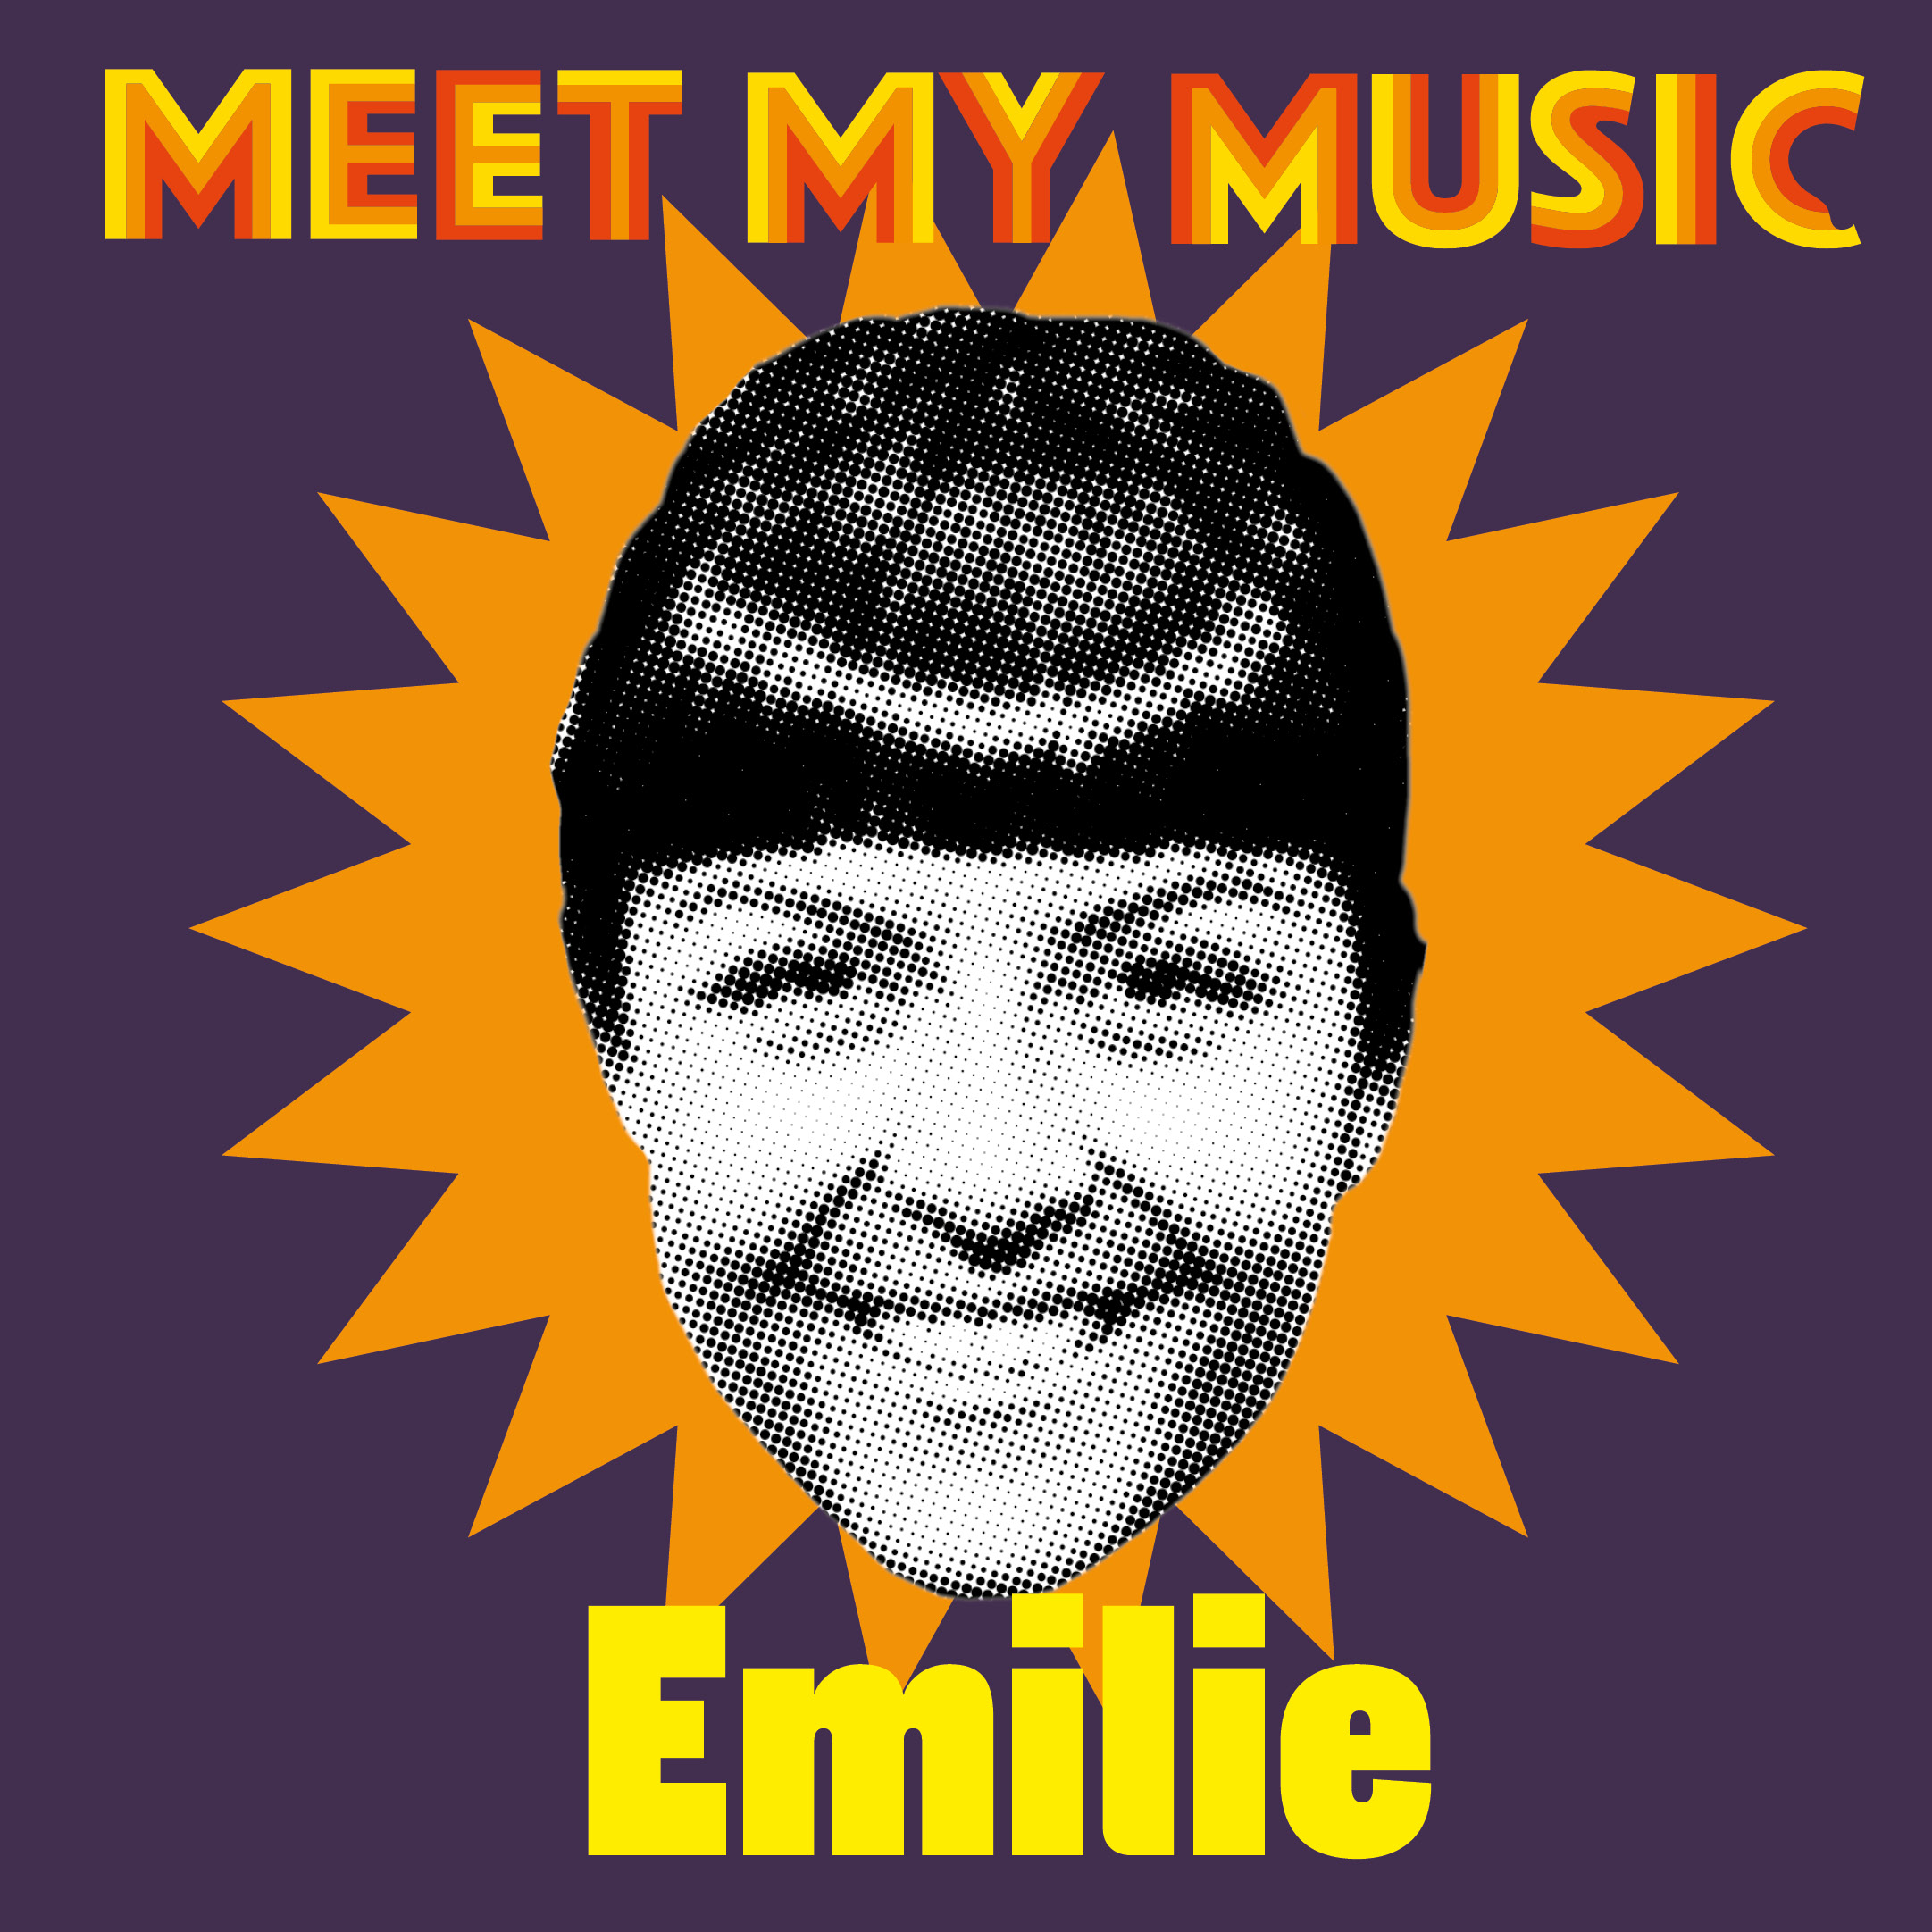 Meet my music Emilie  185.jpg